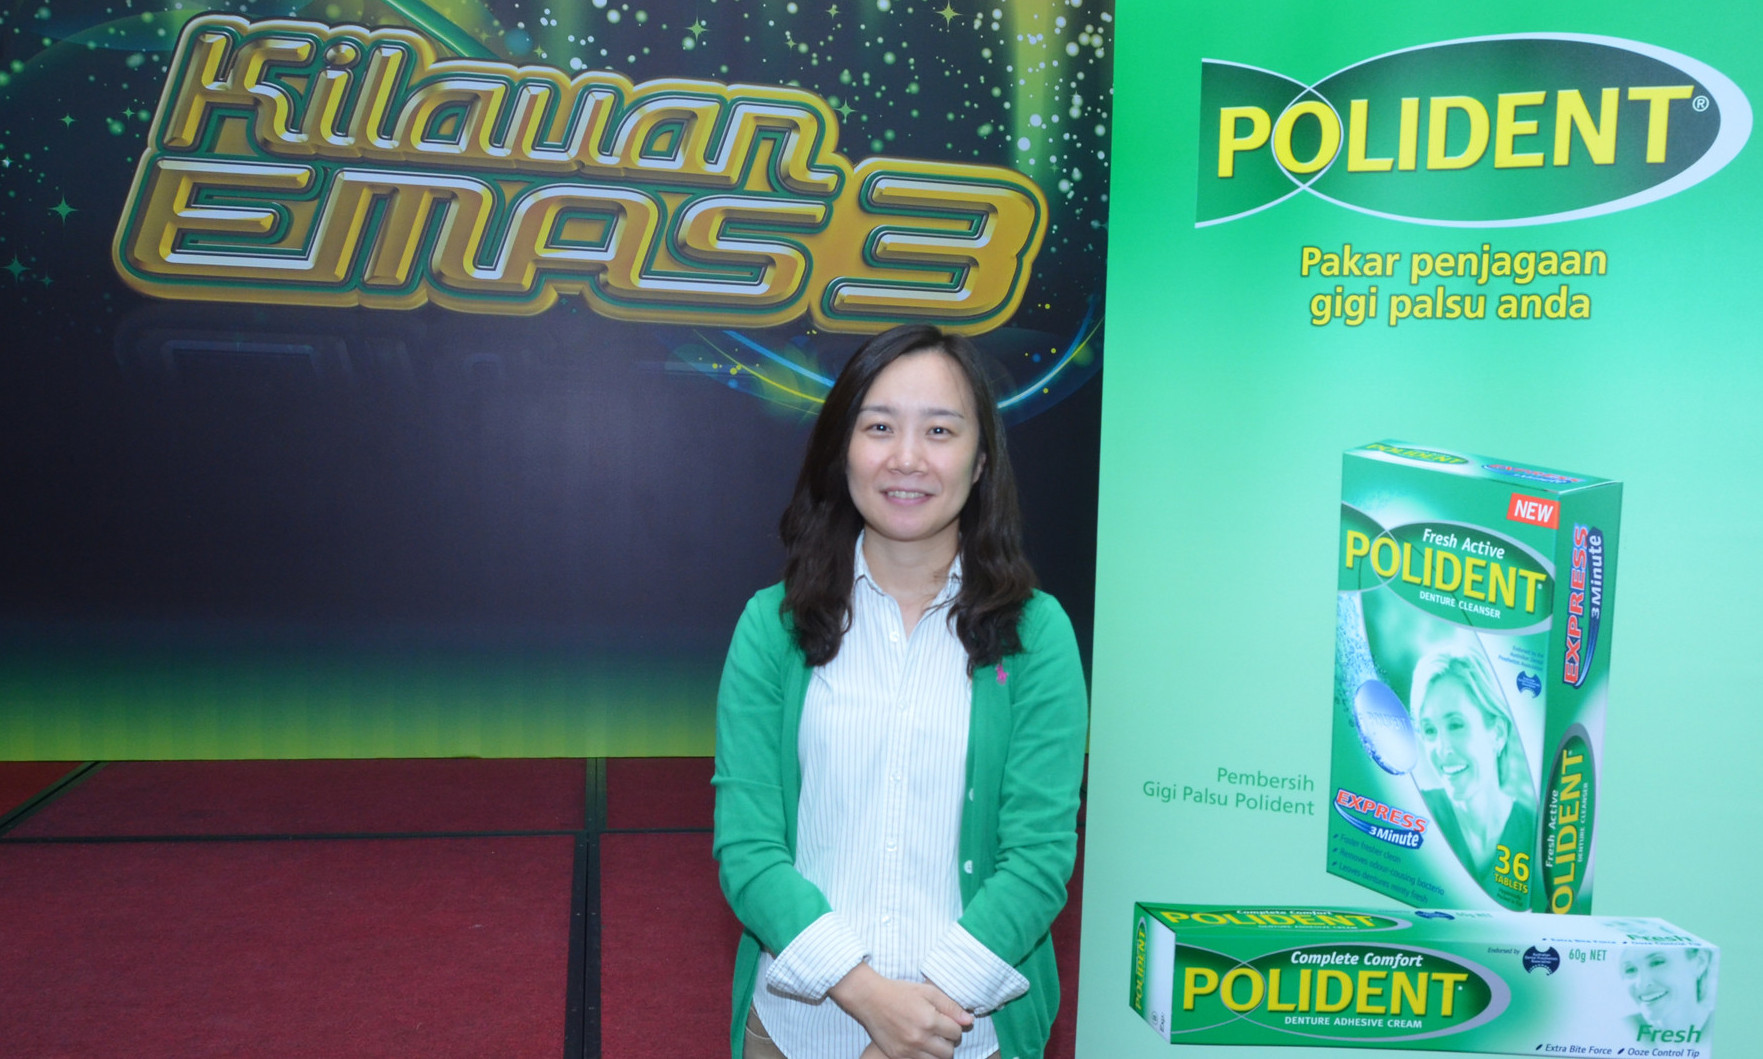 Polident Builds Confidence On Kilauan Emas Marketing Interactive